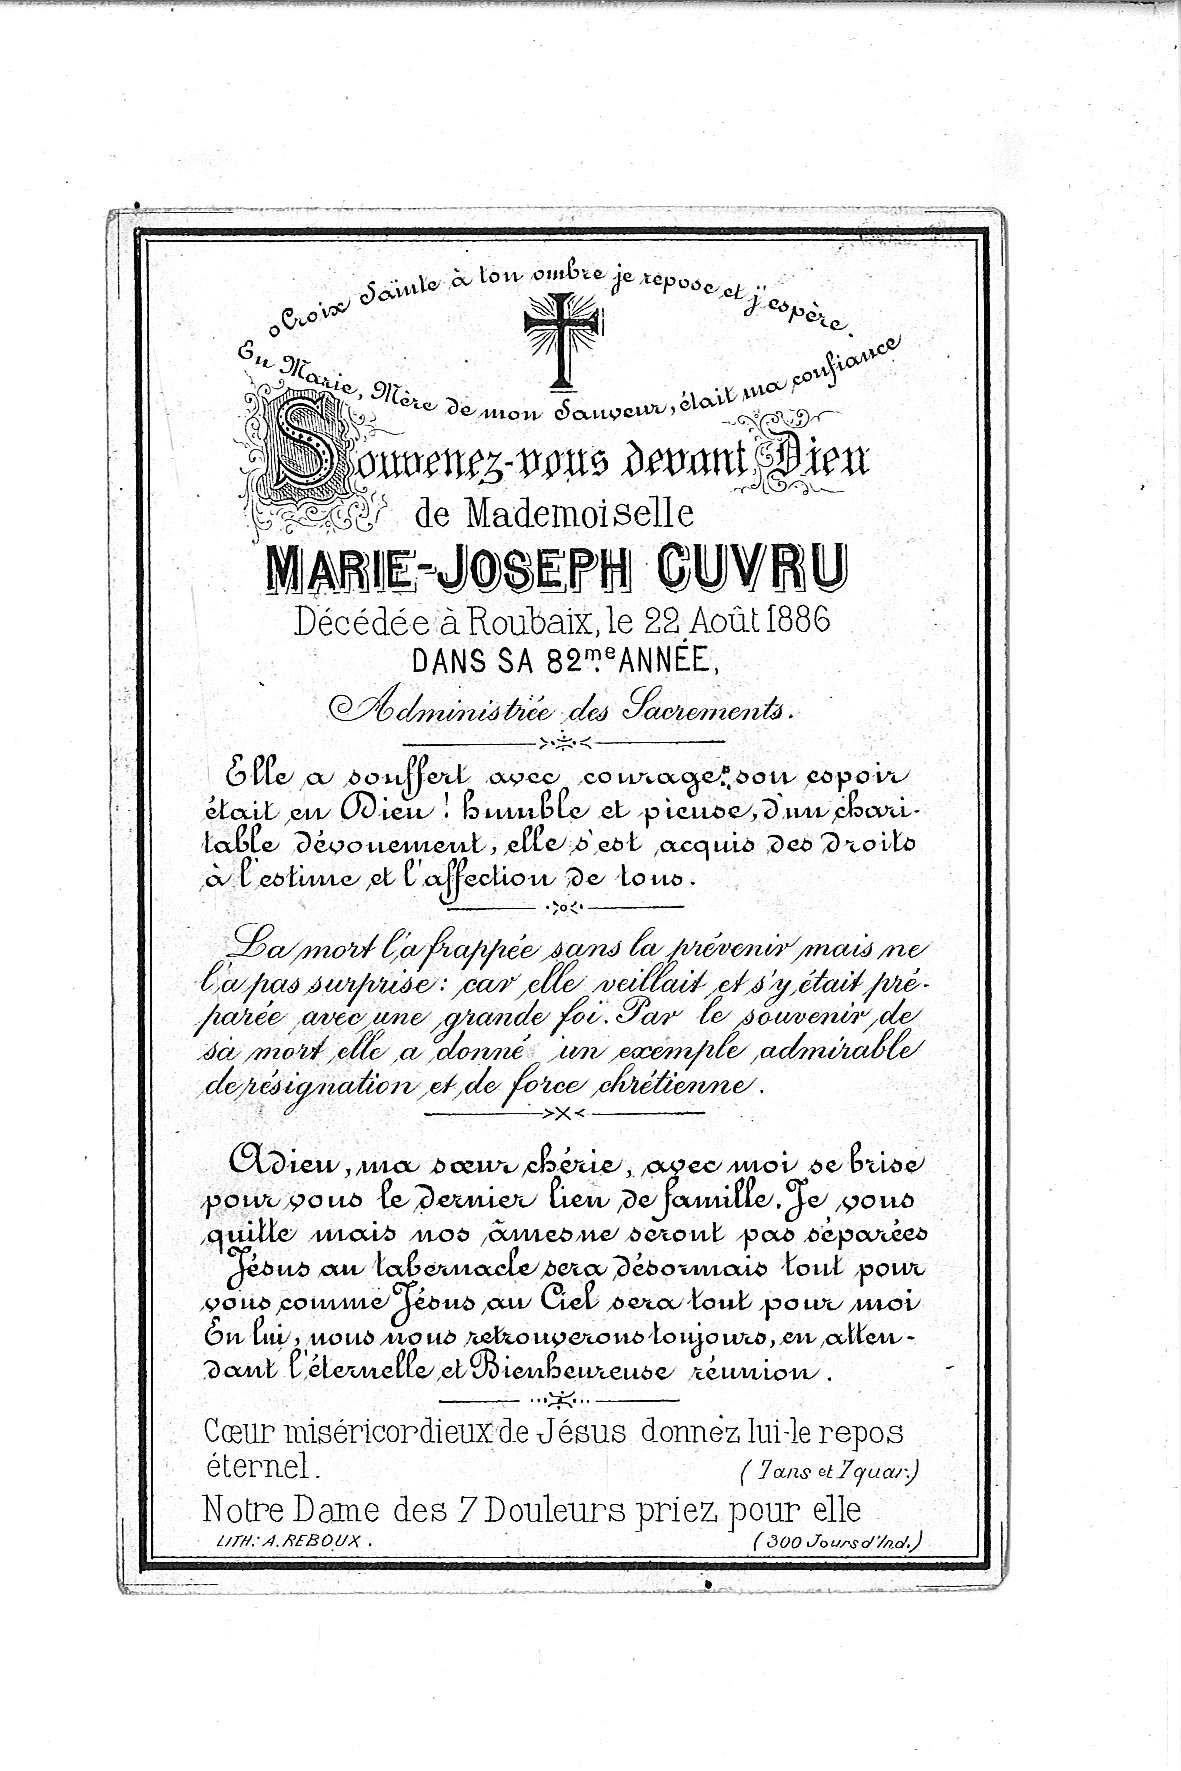 marie-joseph(1886)20120329074916_00052.jpg